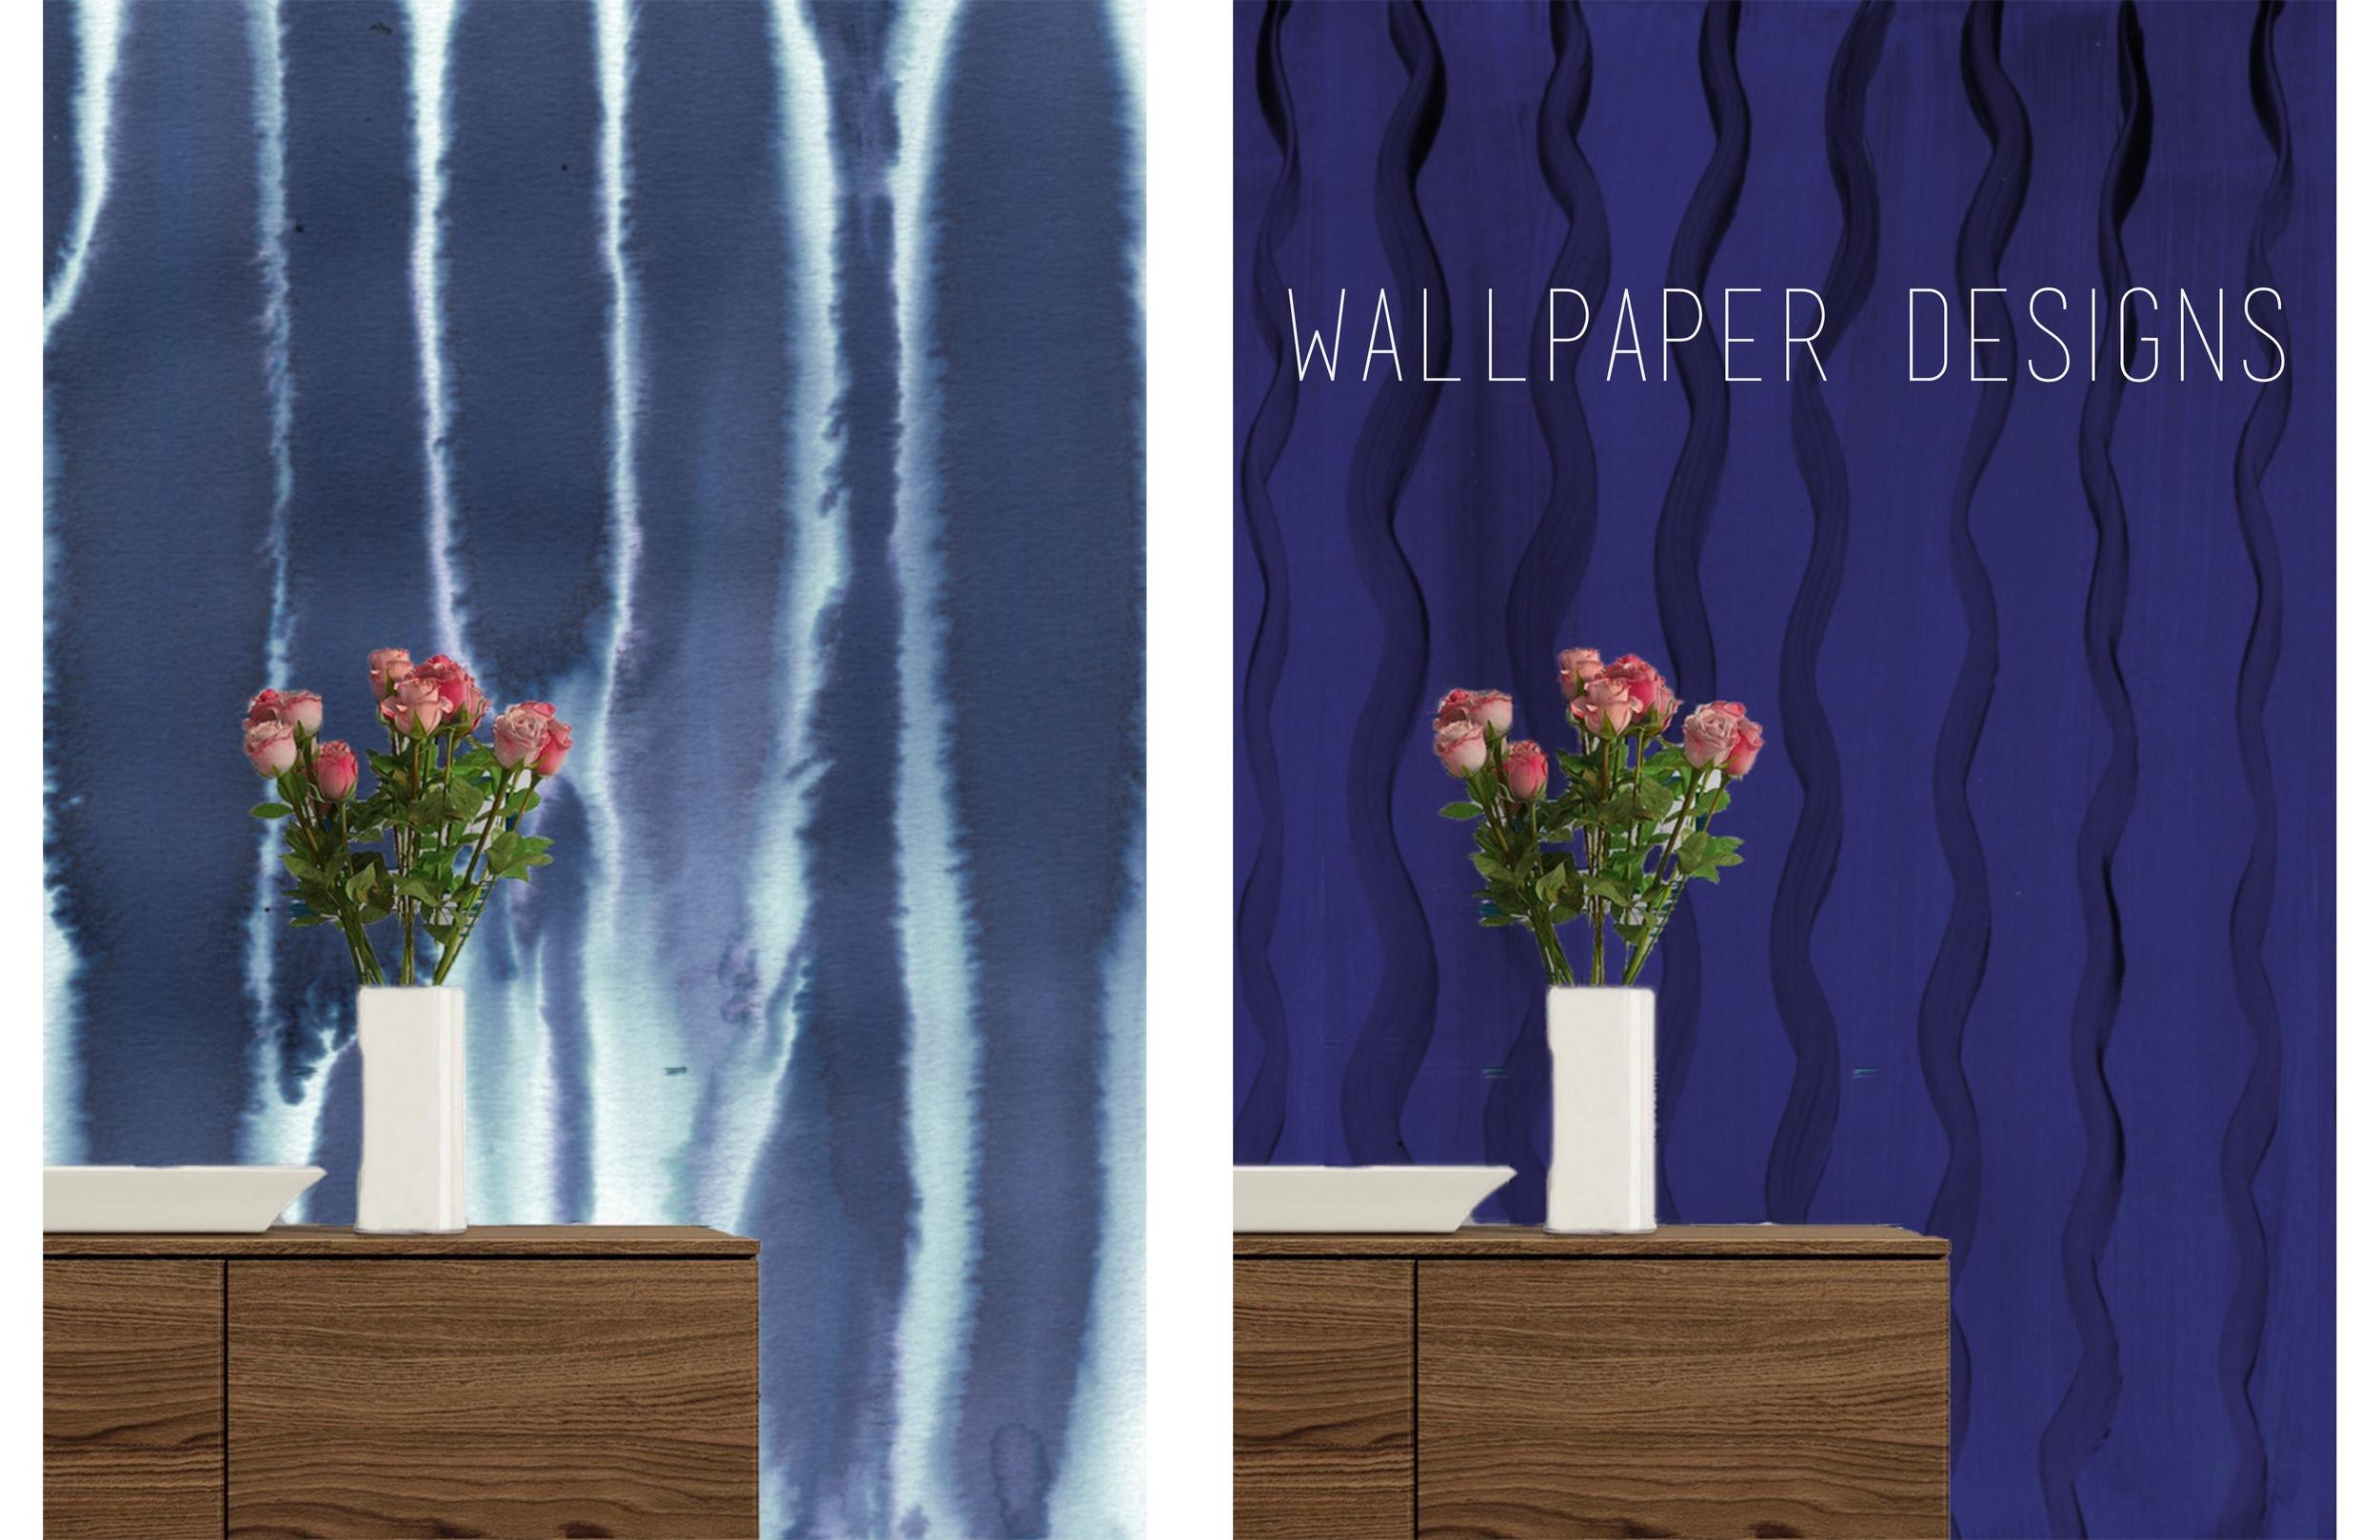 Wallpaper Designs Page 5.jpeg